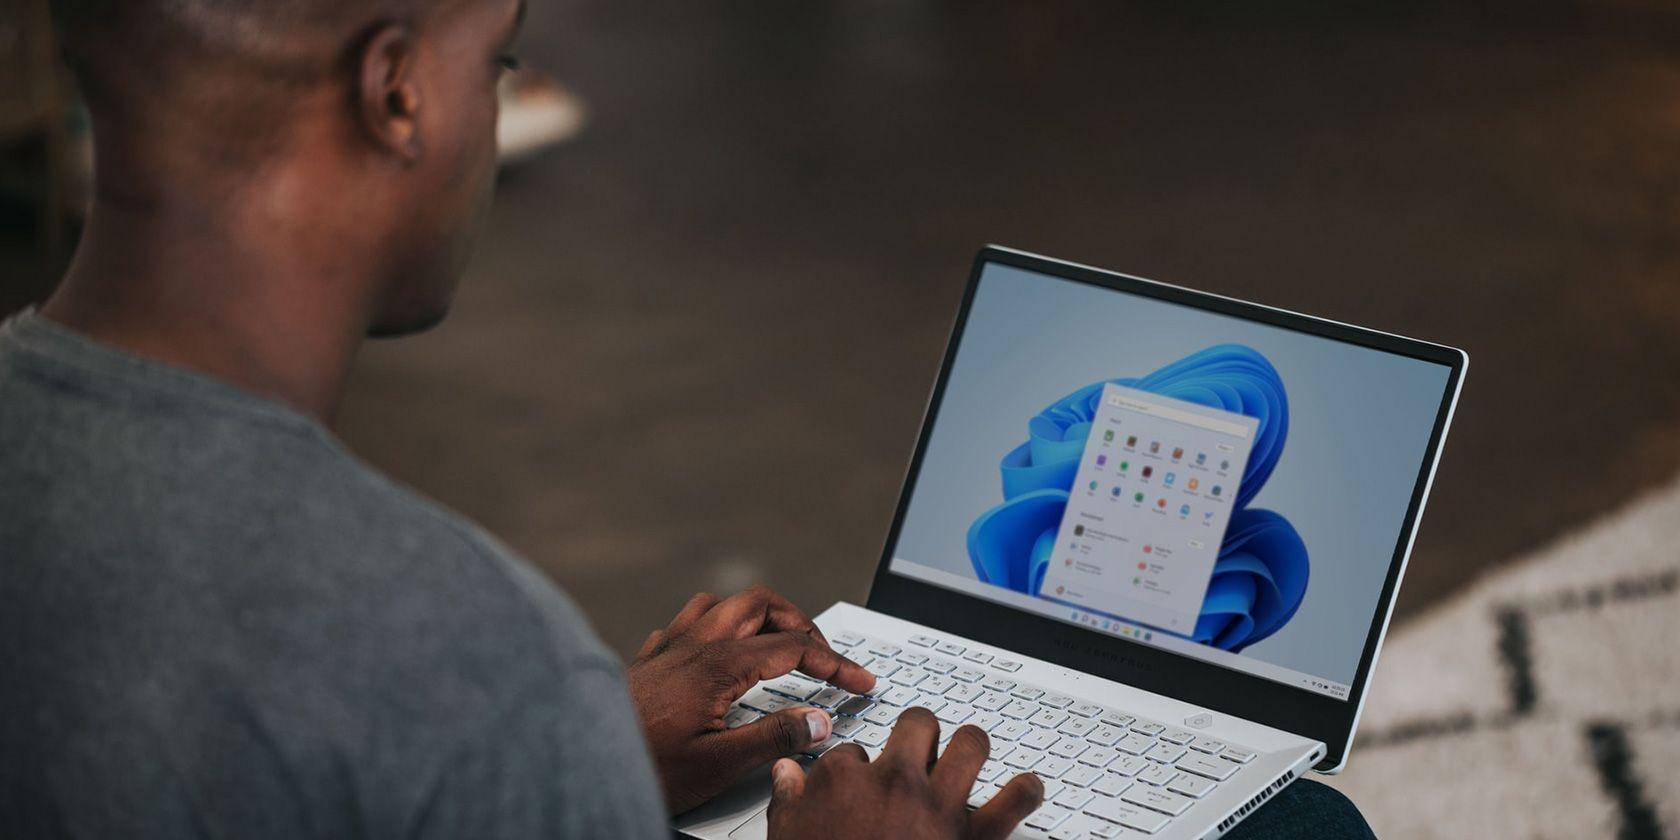 چطور طراحی ویندوز ۱۱ را به ویندوز ۱۰ بیاوریم؟